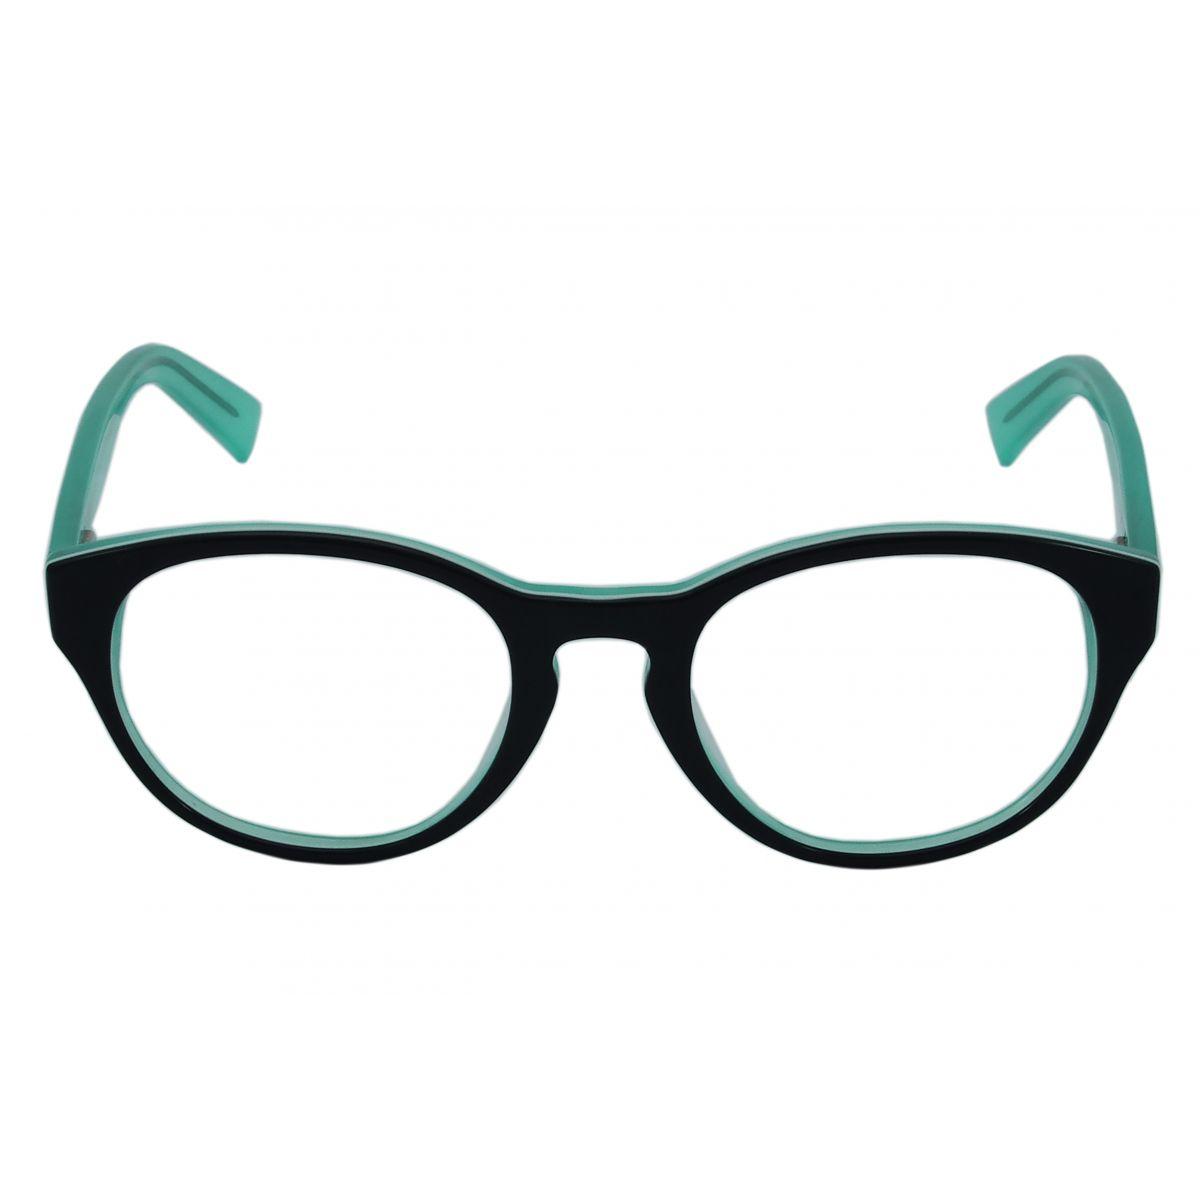 d5eceb7ec4dc6 Oculos Oakley Feminino Lançamento 2012